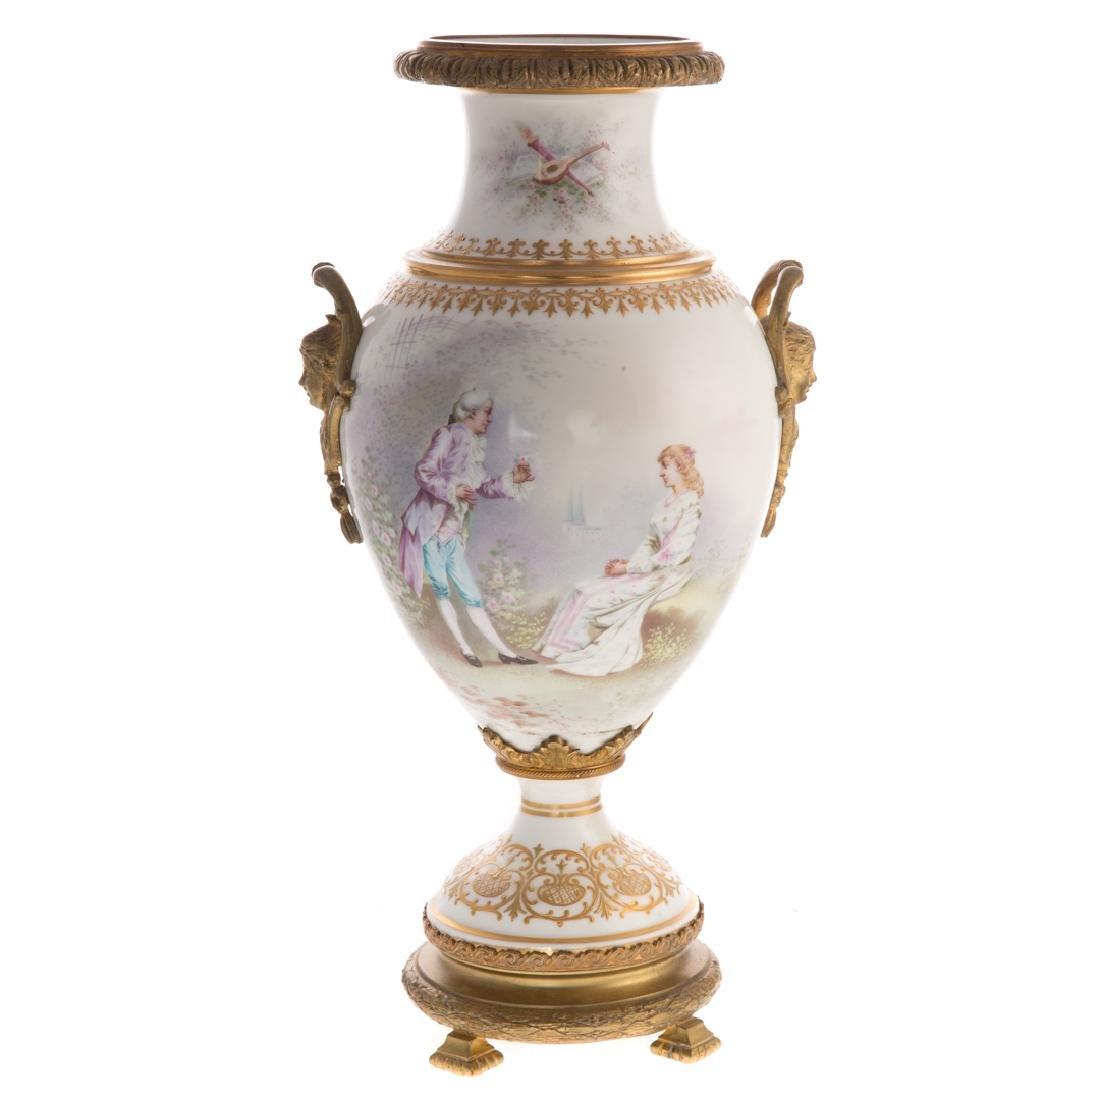 French Sevres style porcelain vase